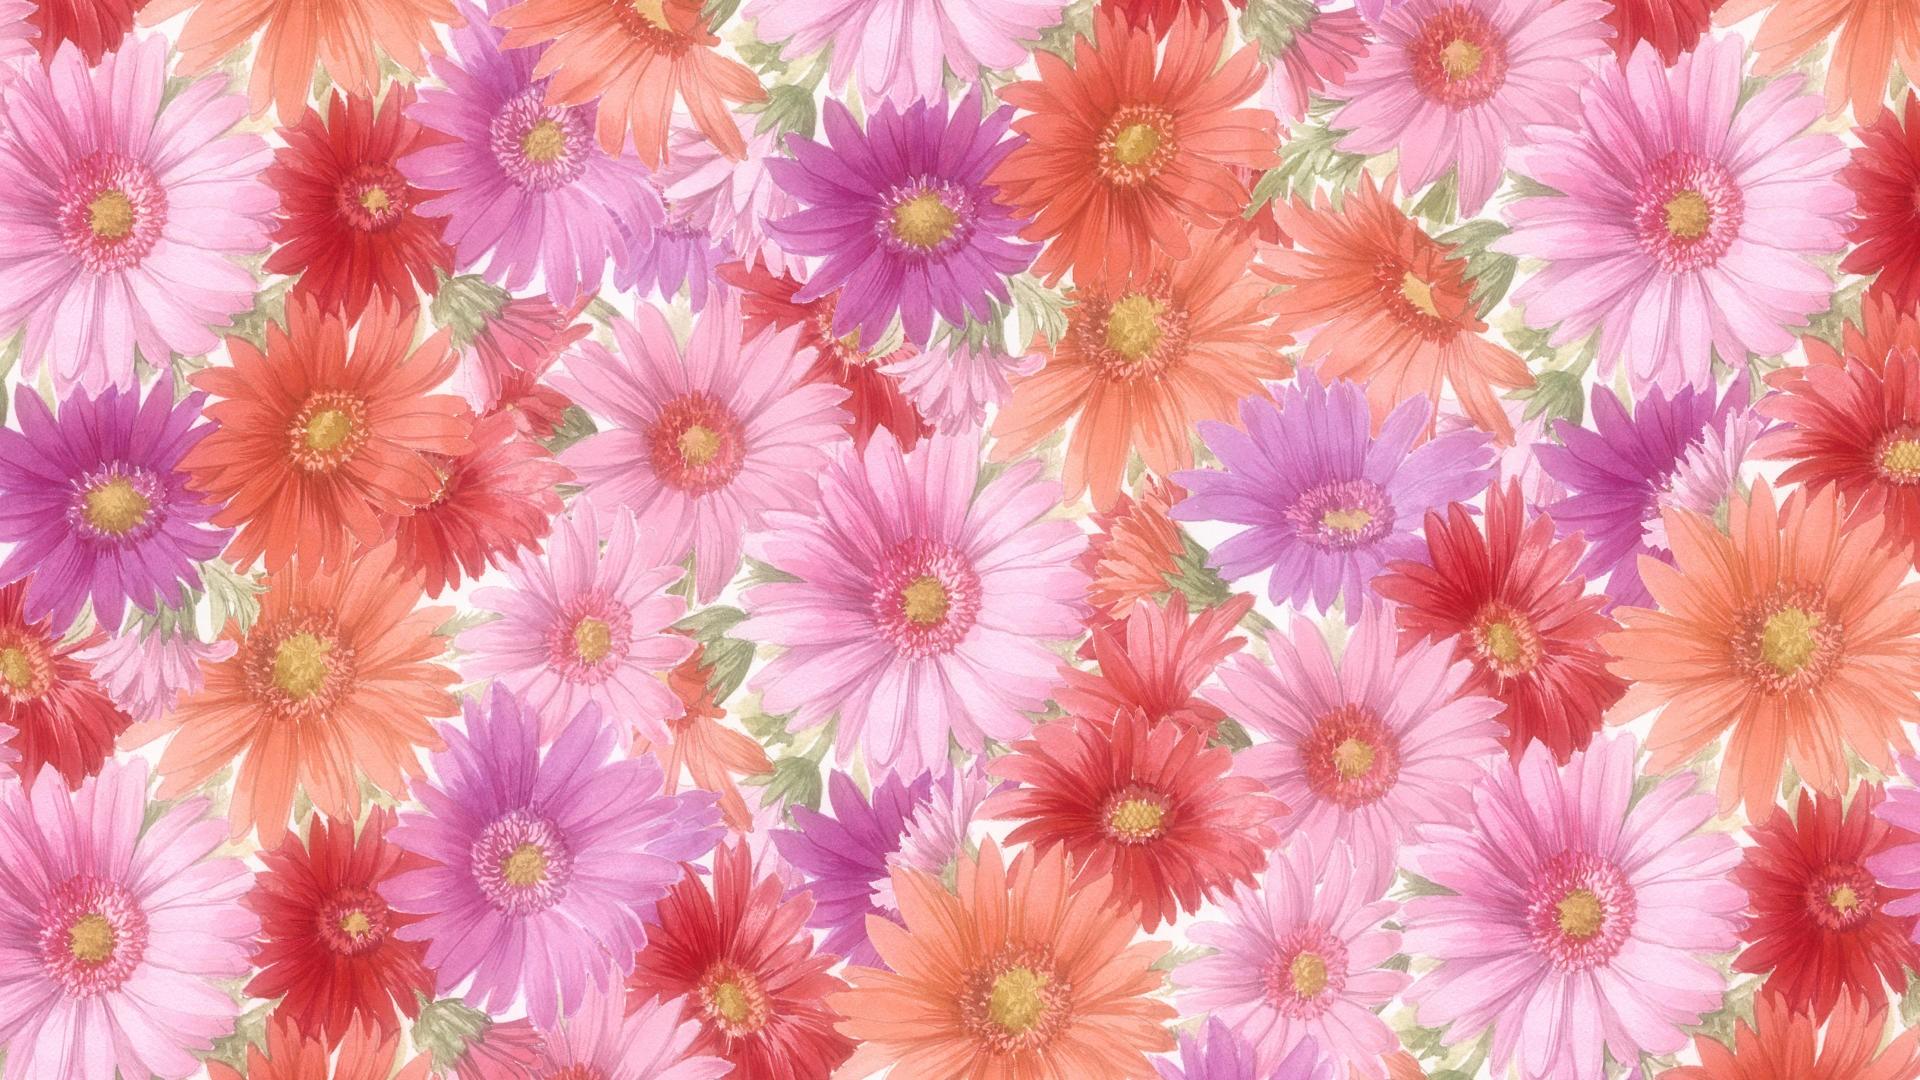 Flowers Wallpapers For Desktop